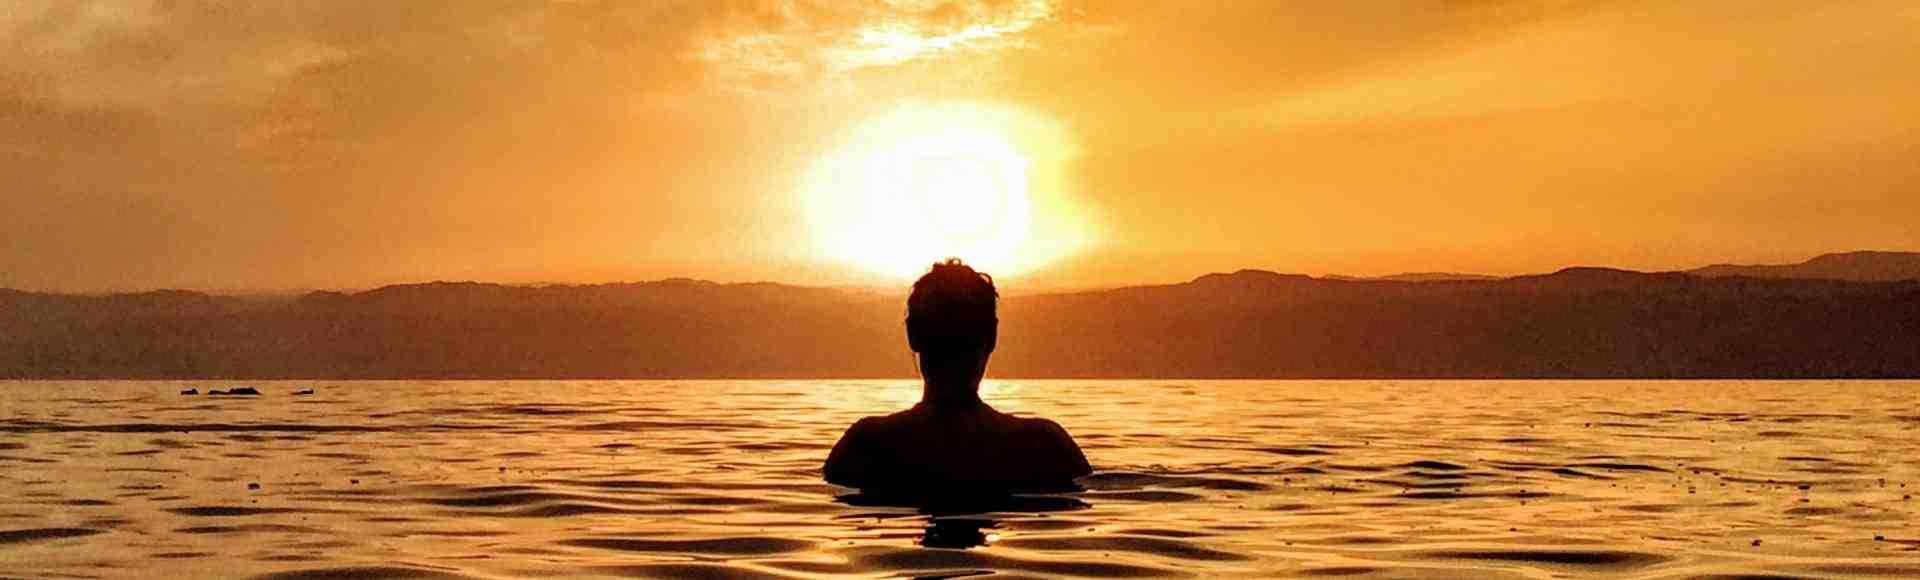 How long does pool solar last?